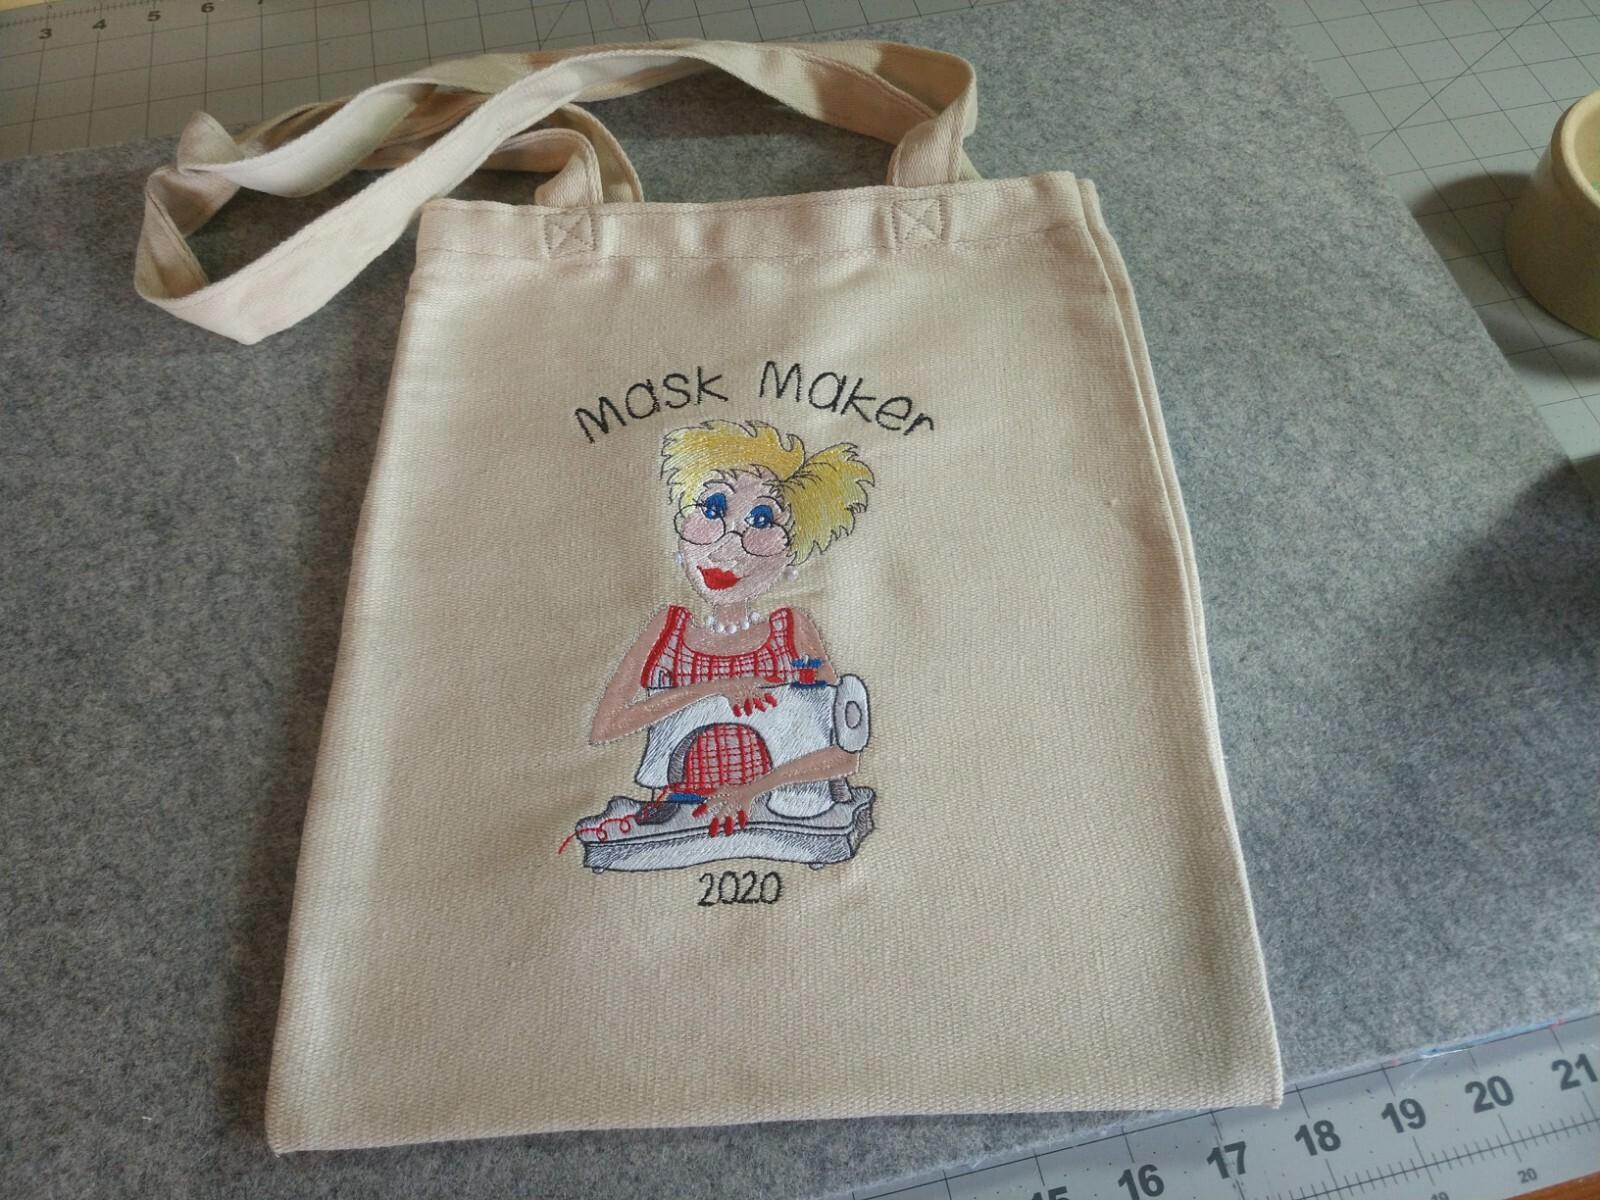 Mask Maker 2020